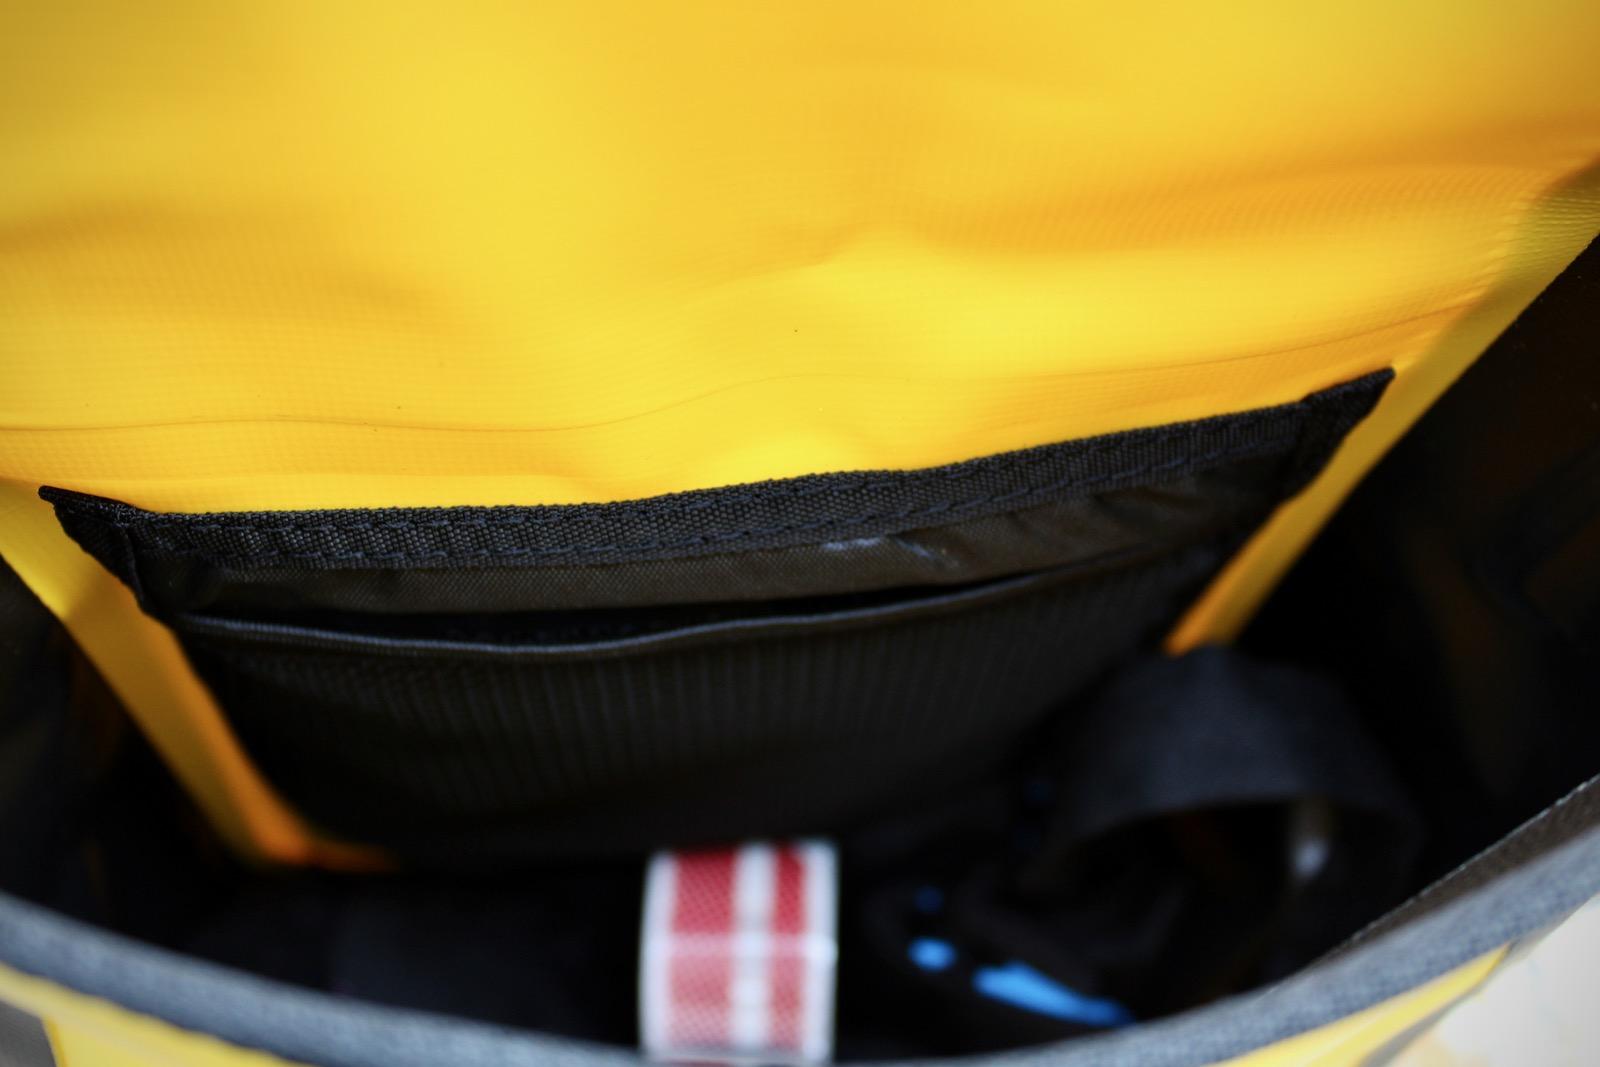 Review Craft Cadence Small Waterproof Handlebar Bag